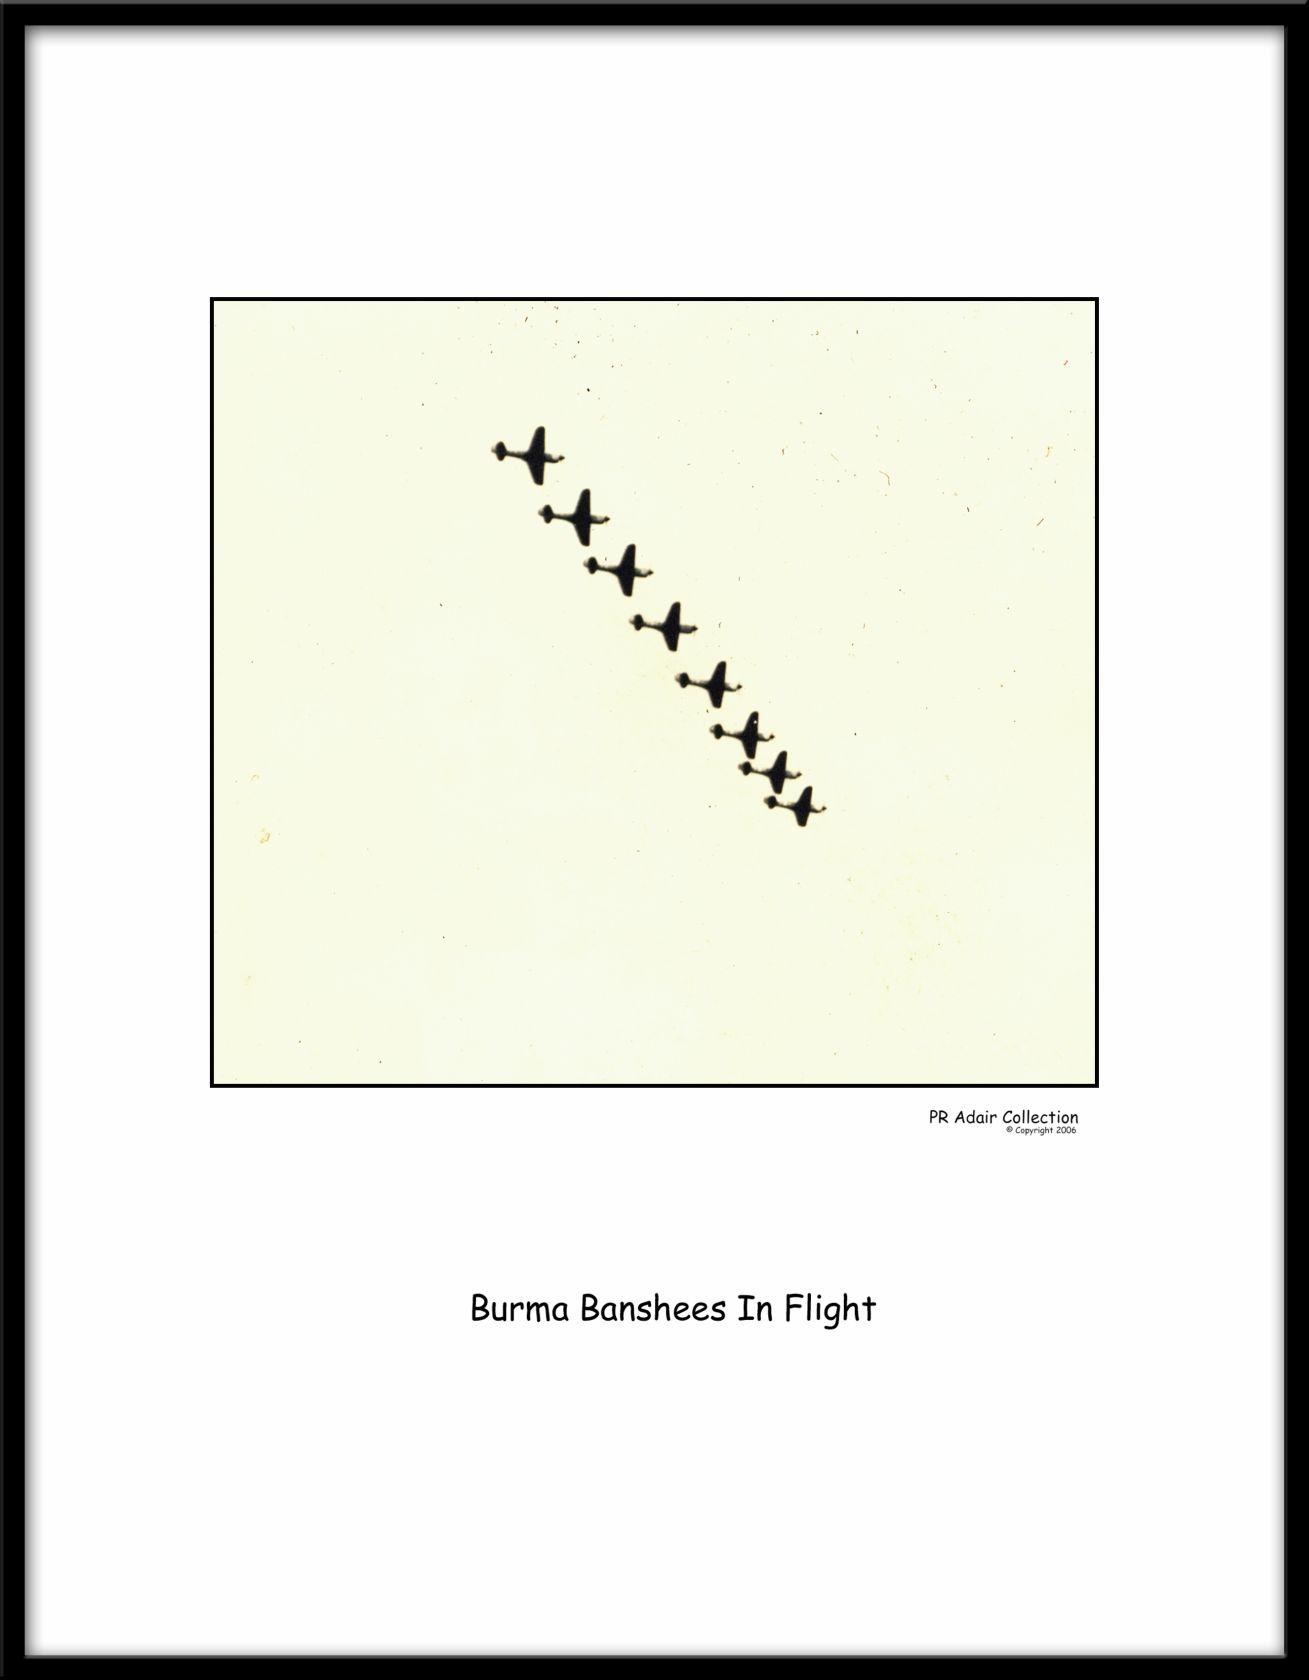 Burma Banshee 118